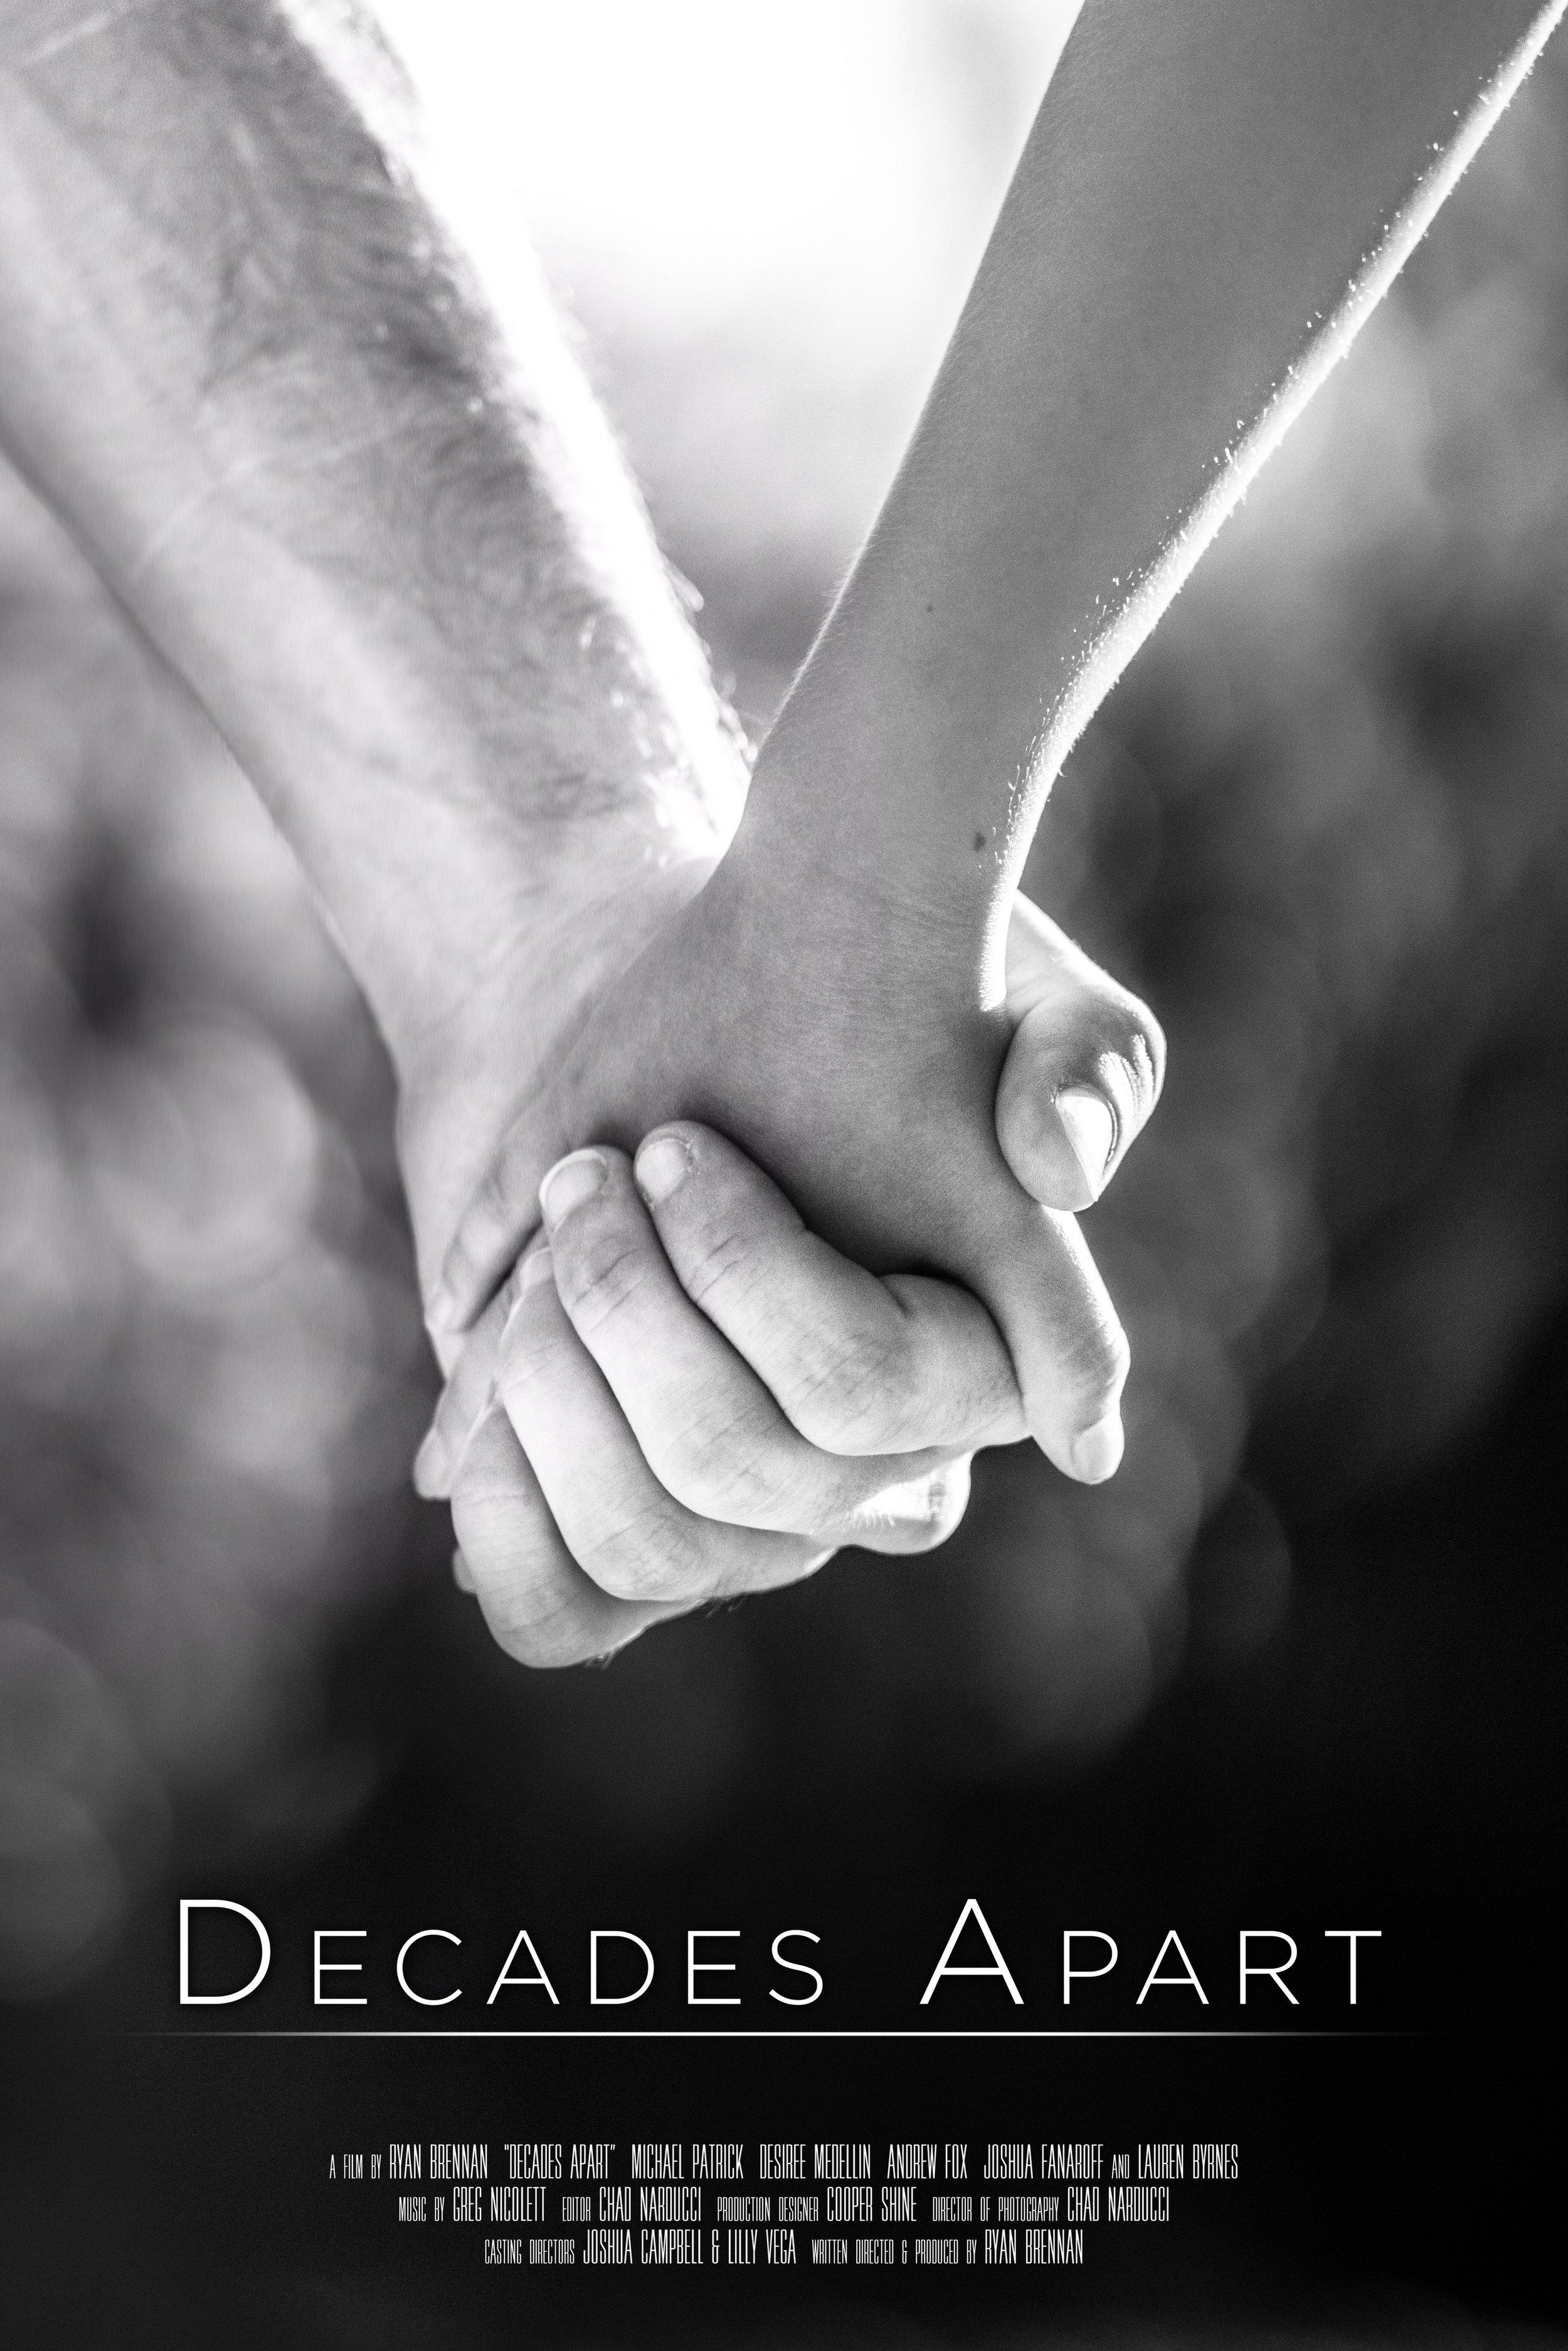 Decades Apart Official Poster.jpeg